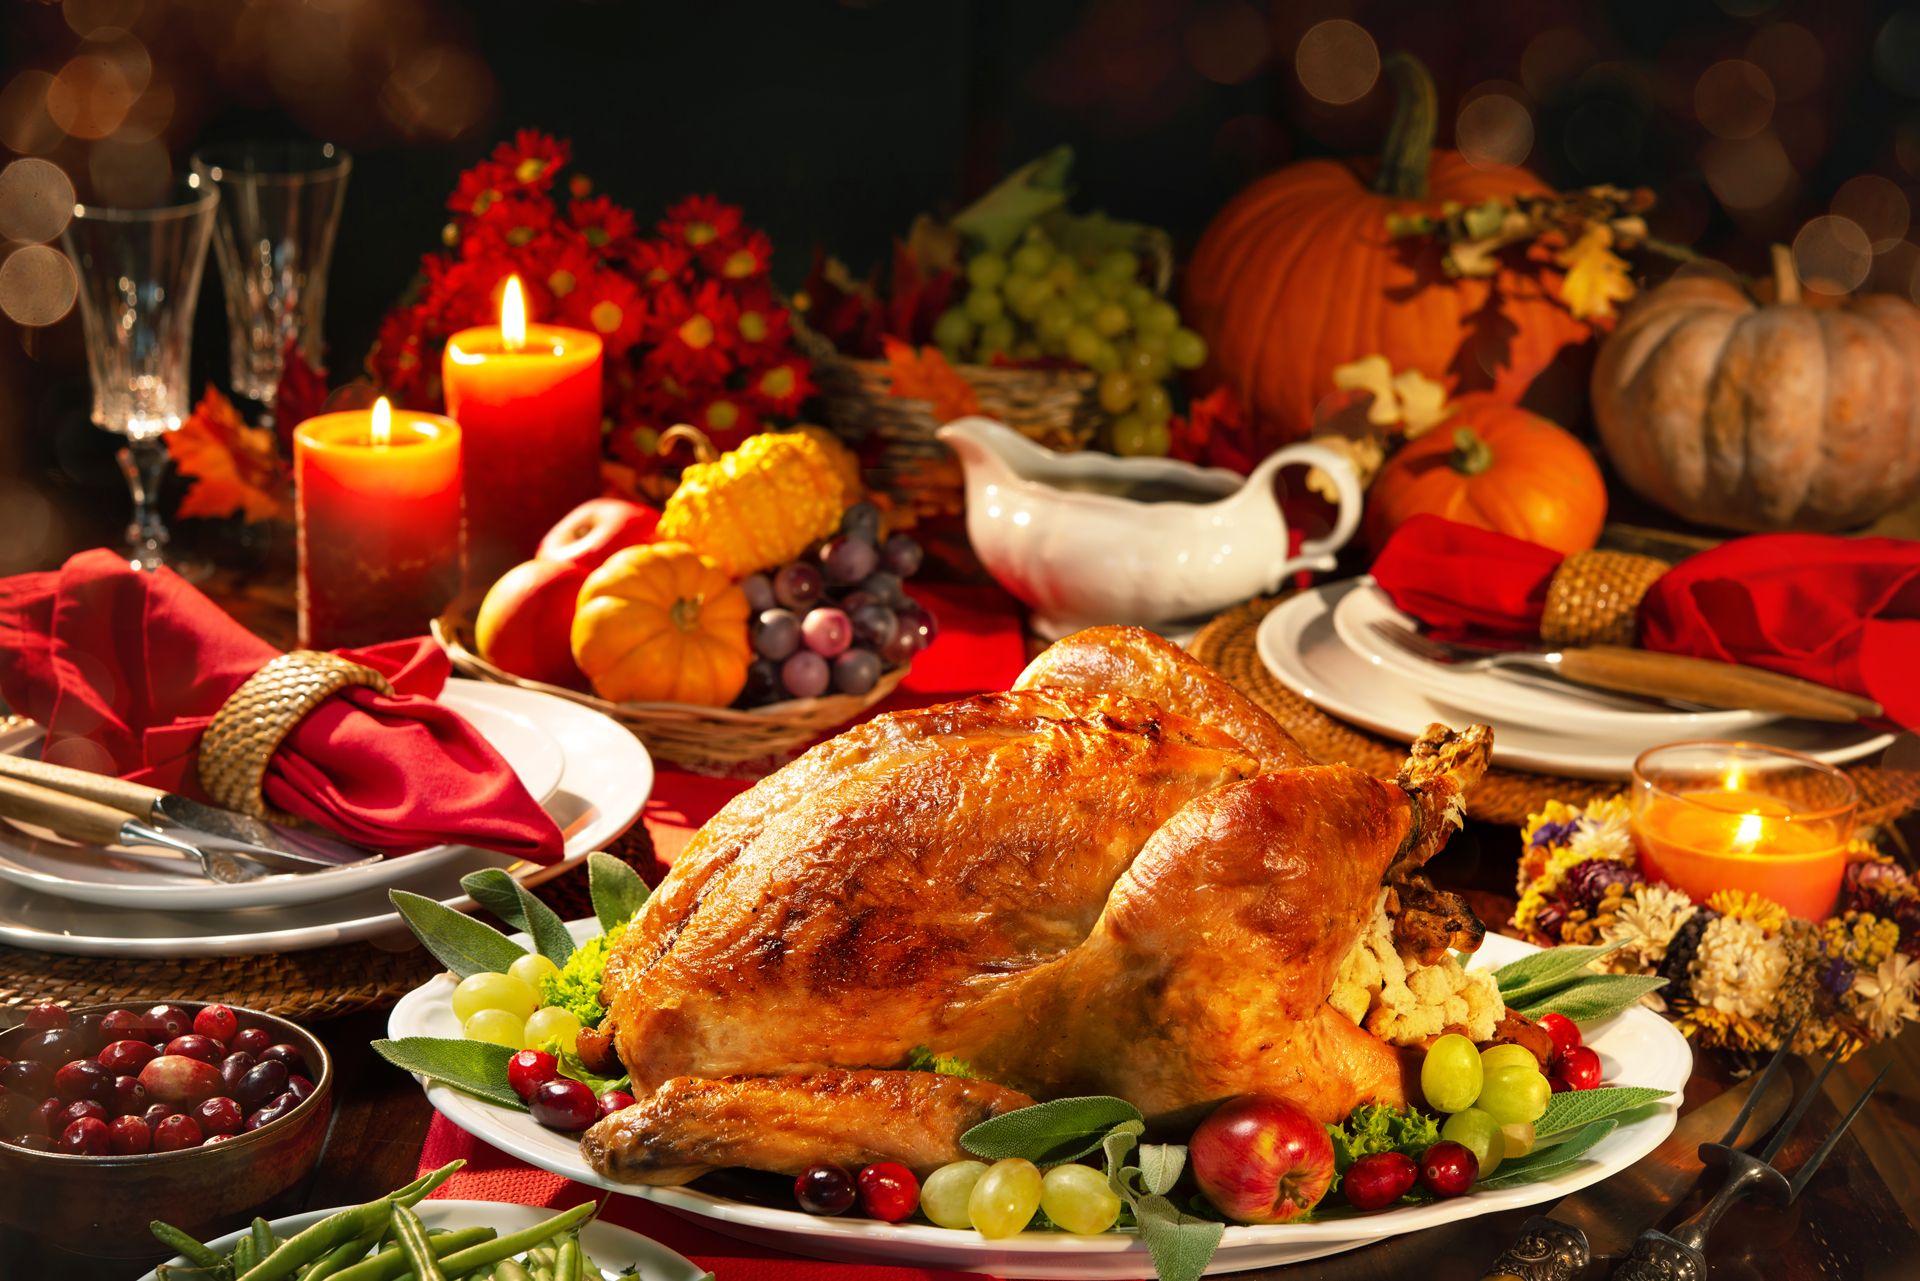 Enjoy a Festive Meal at the Heart of Cebu